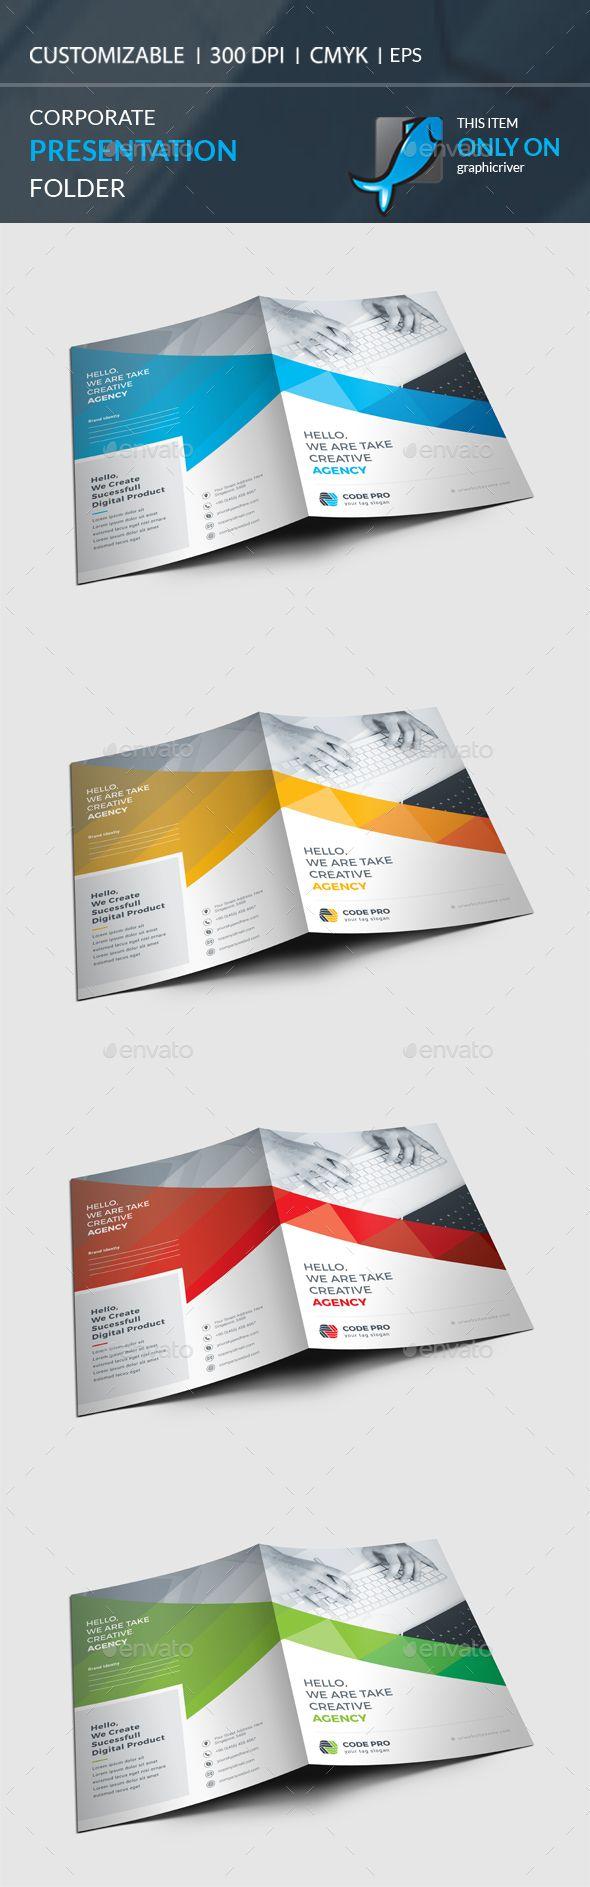 Presentation Folder | Pinterest